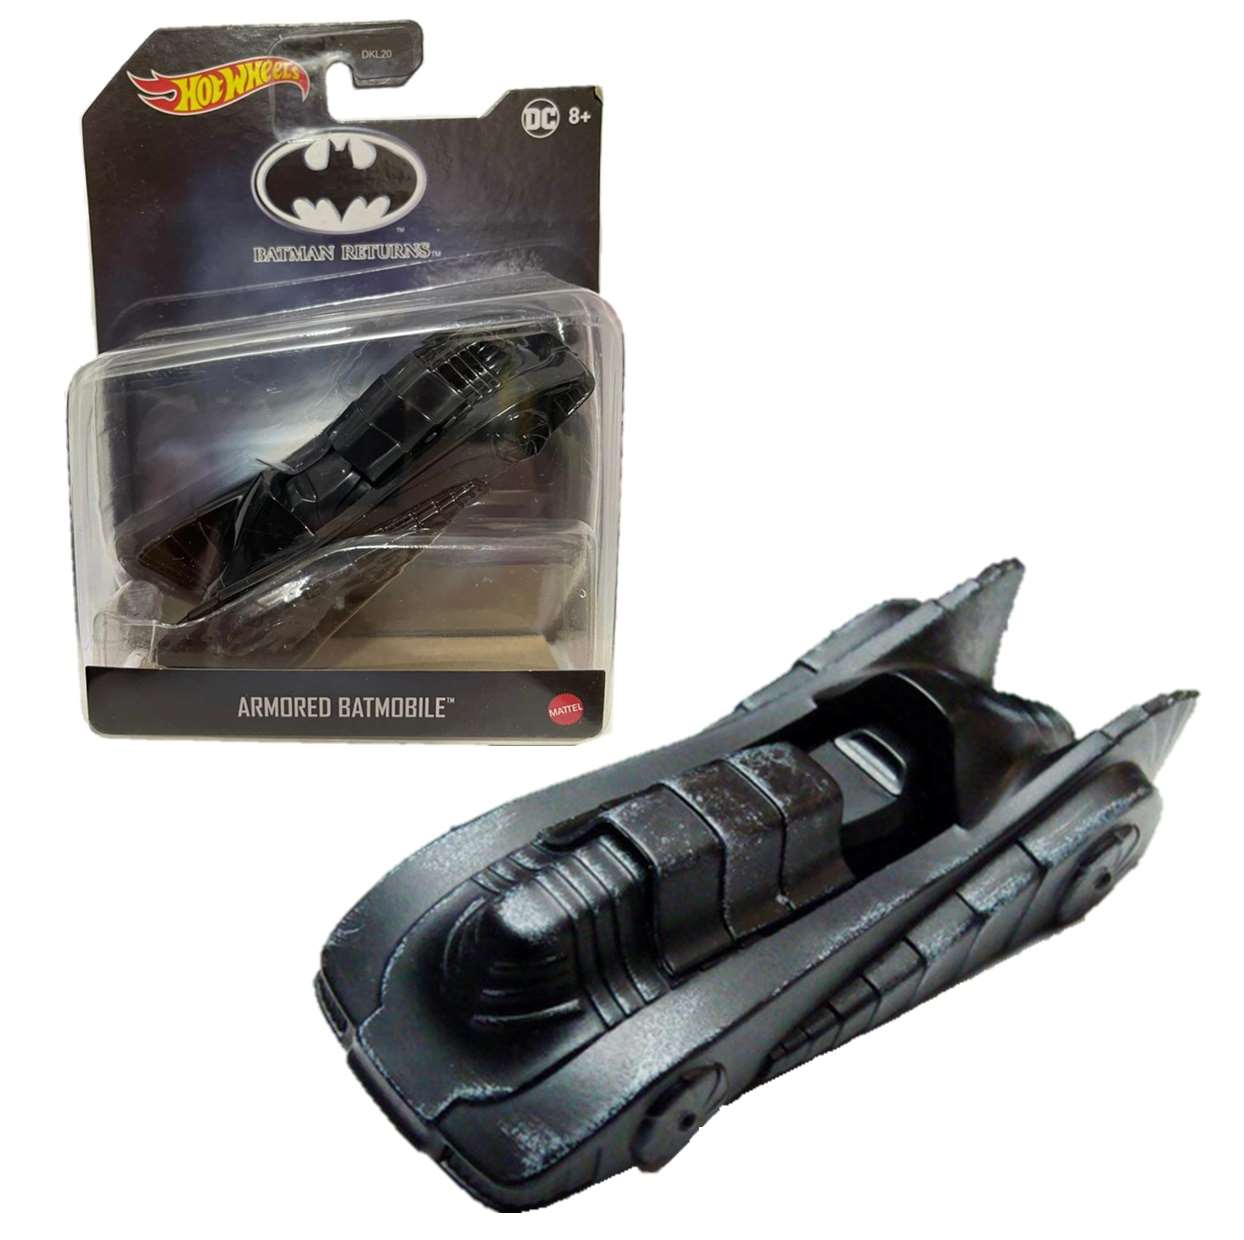 Armored Batmobile Dkl20 Hot Wheels Batman Returns